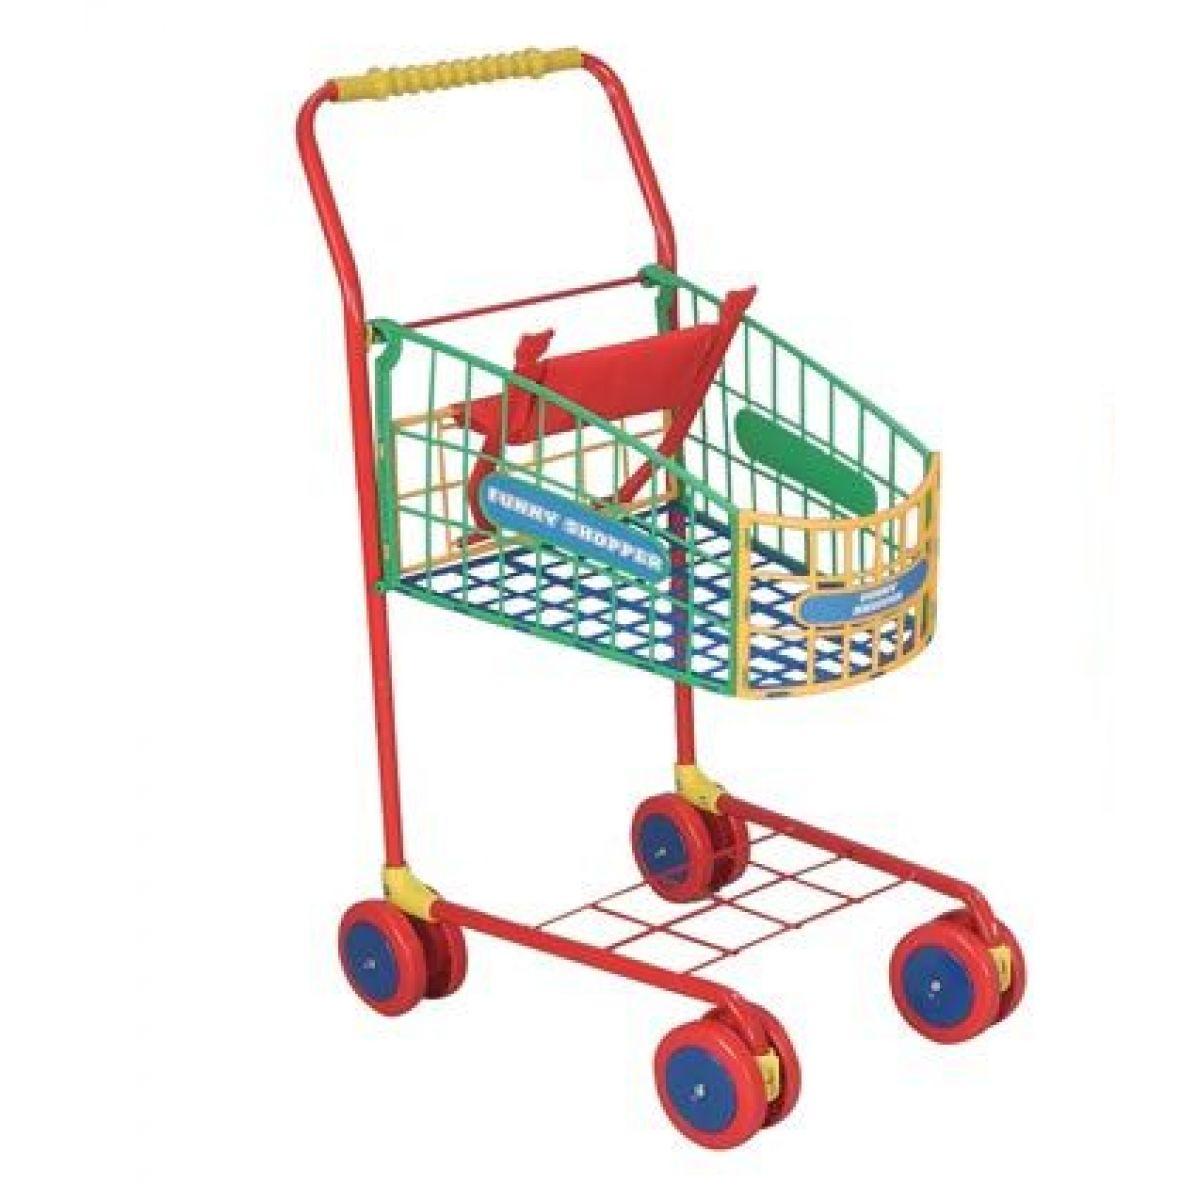 Simba S 4504899 - Kovový nákupní vozík